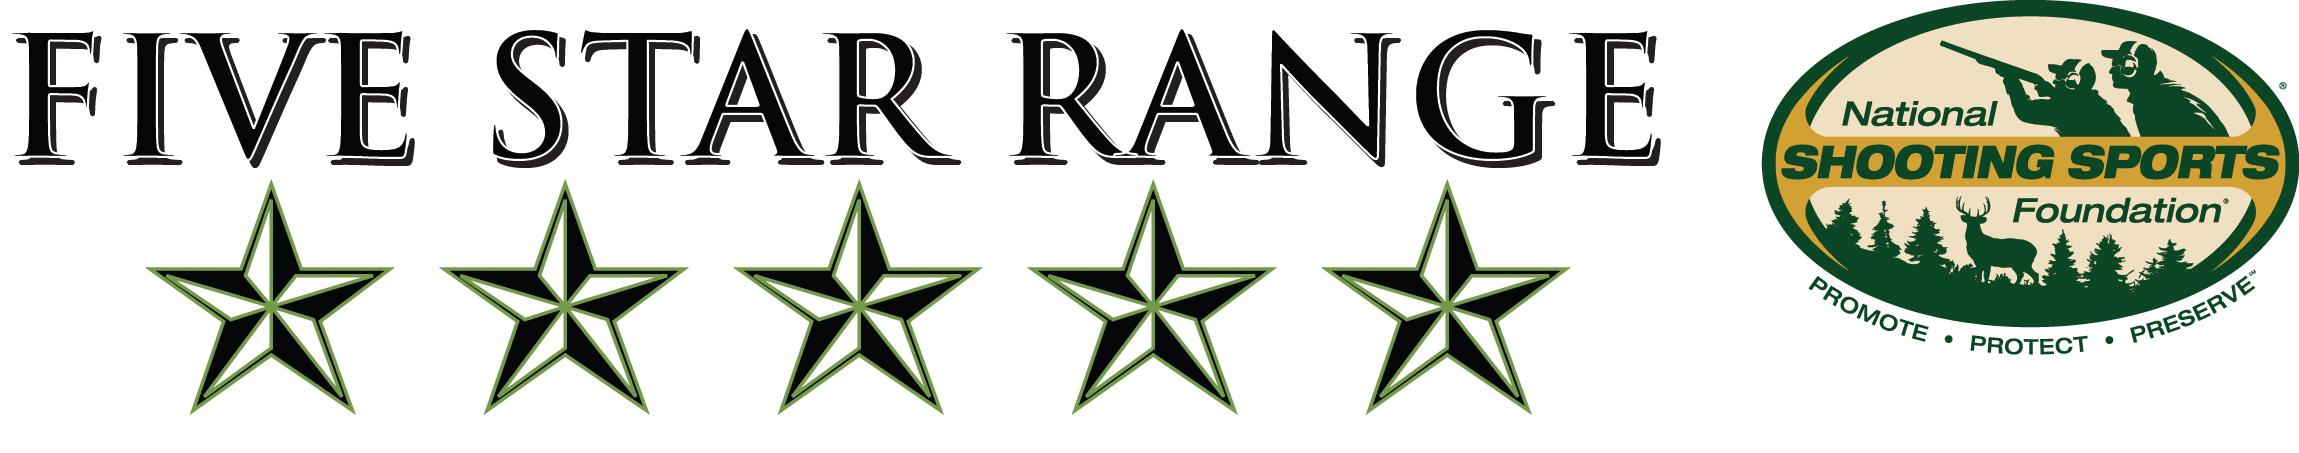 nssf-five-star-range-royal-range-usa.jpg